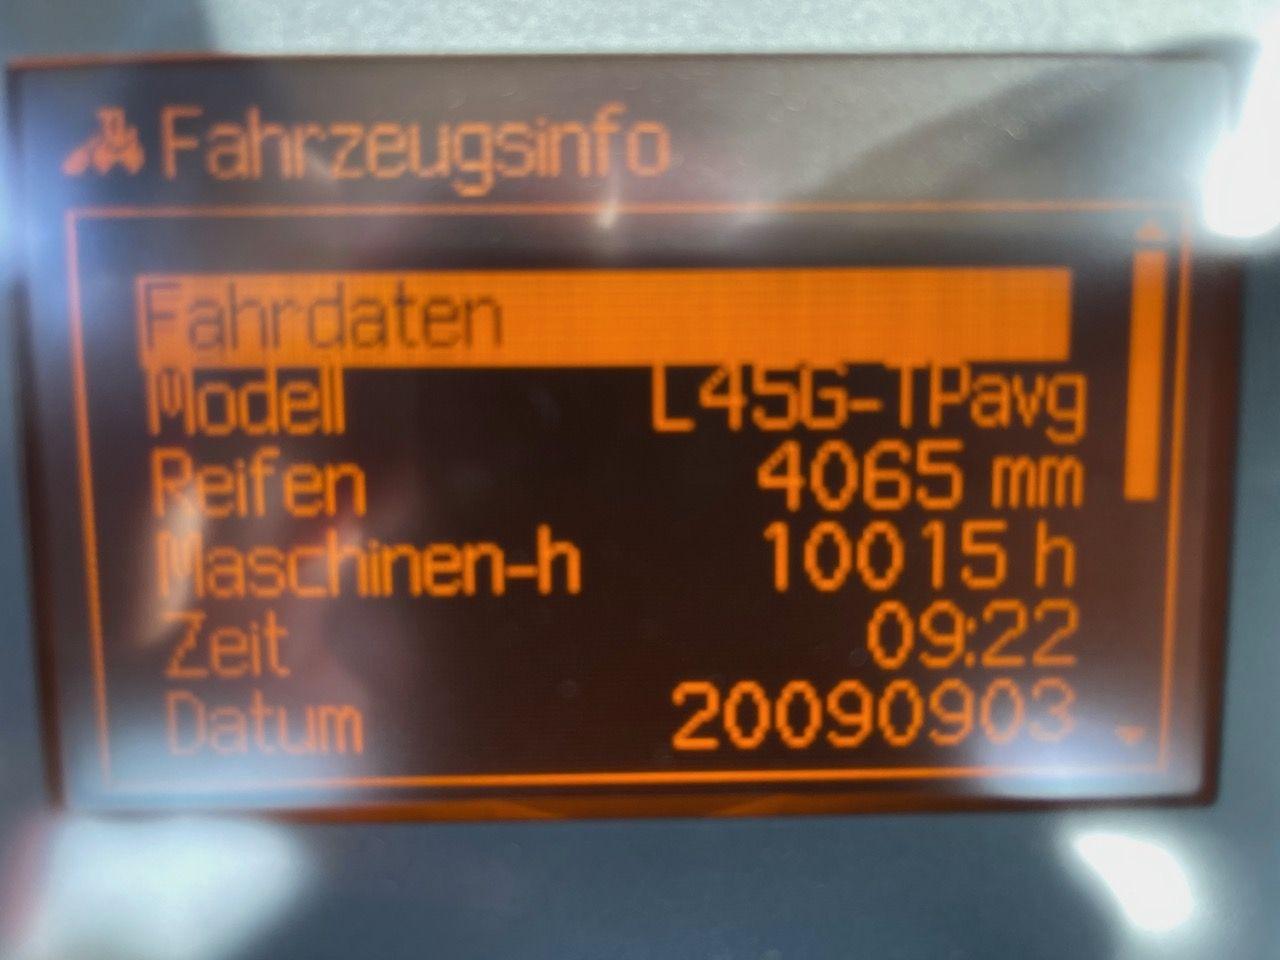 Volvo L45G TP